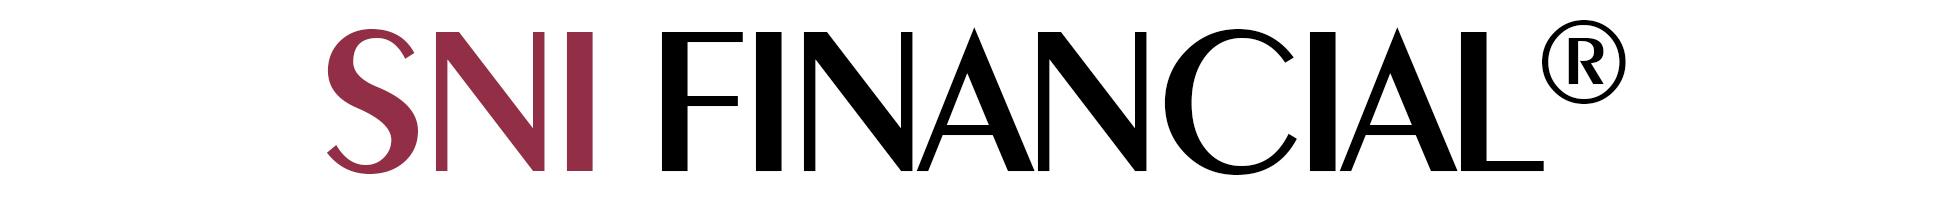 SNI Financial